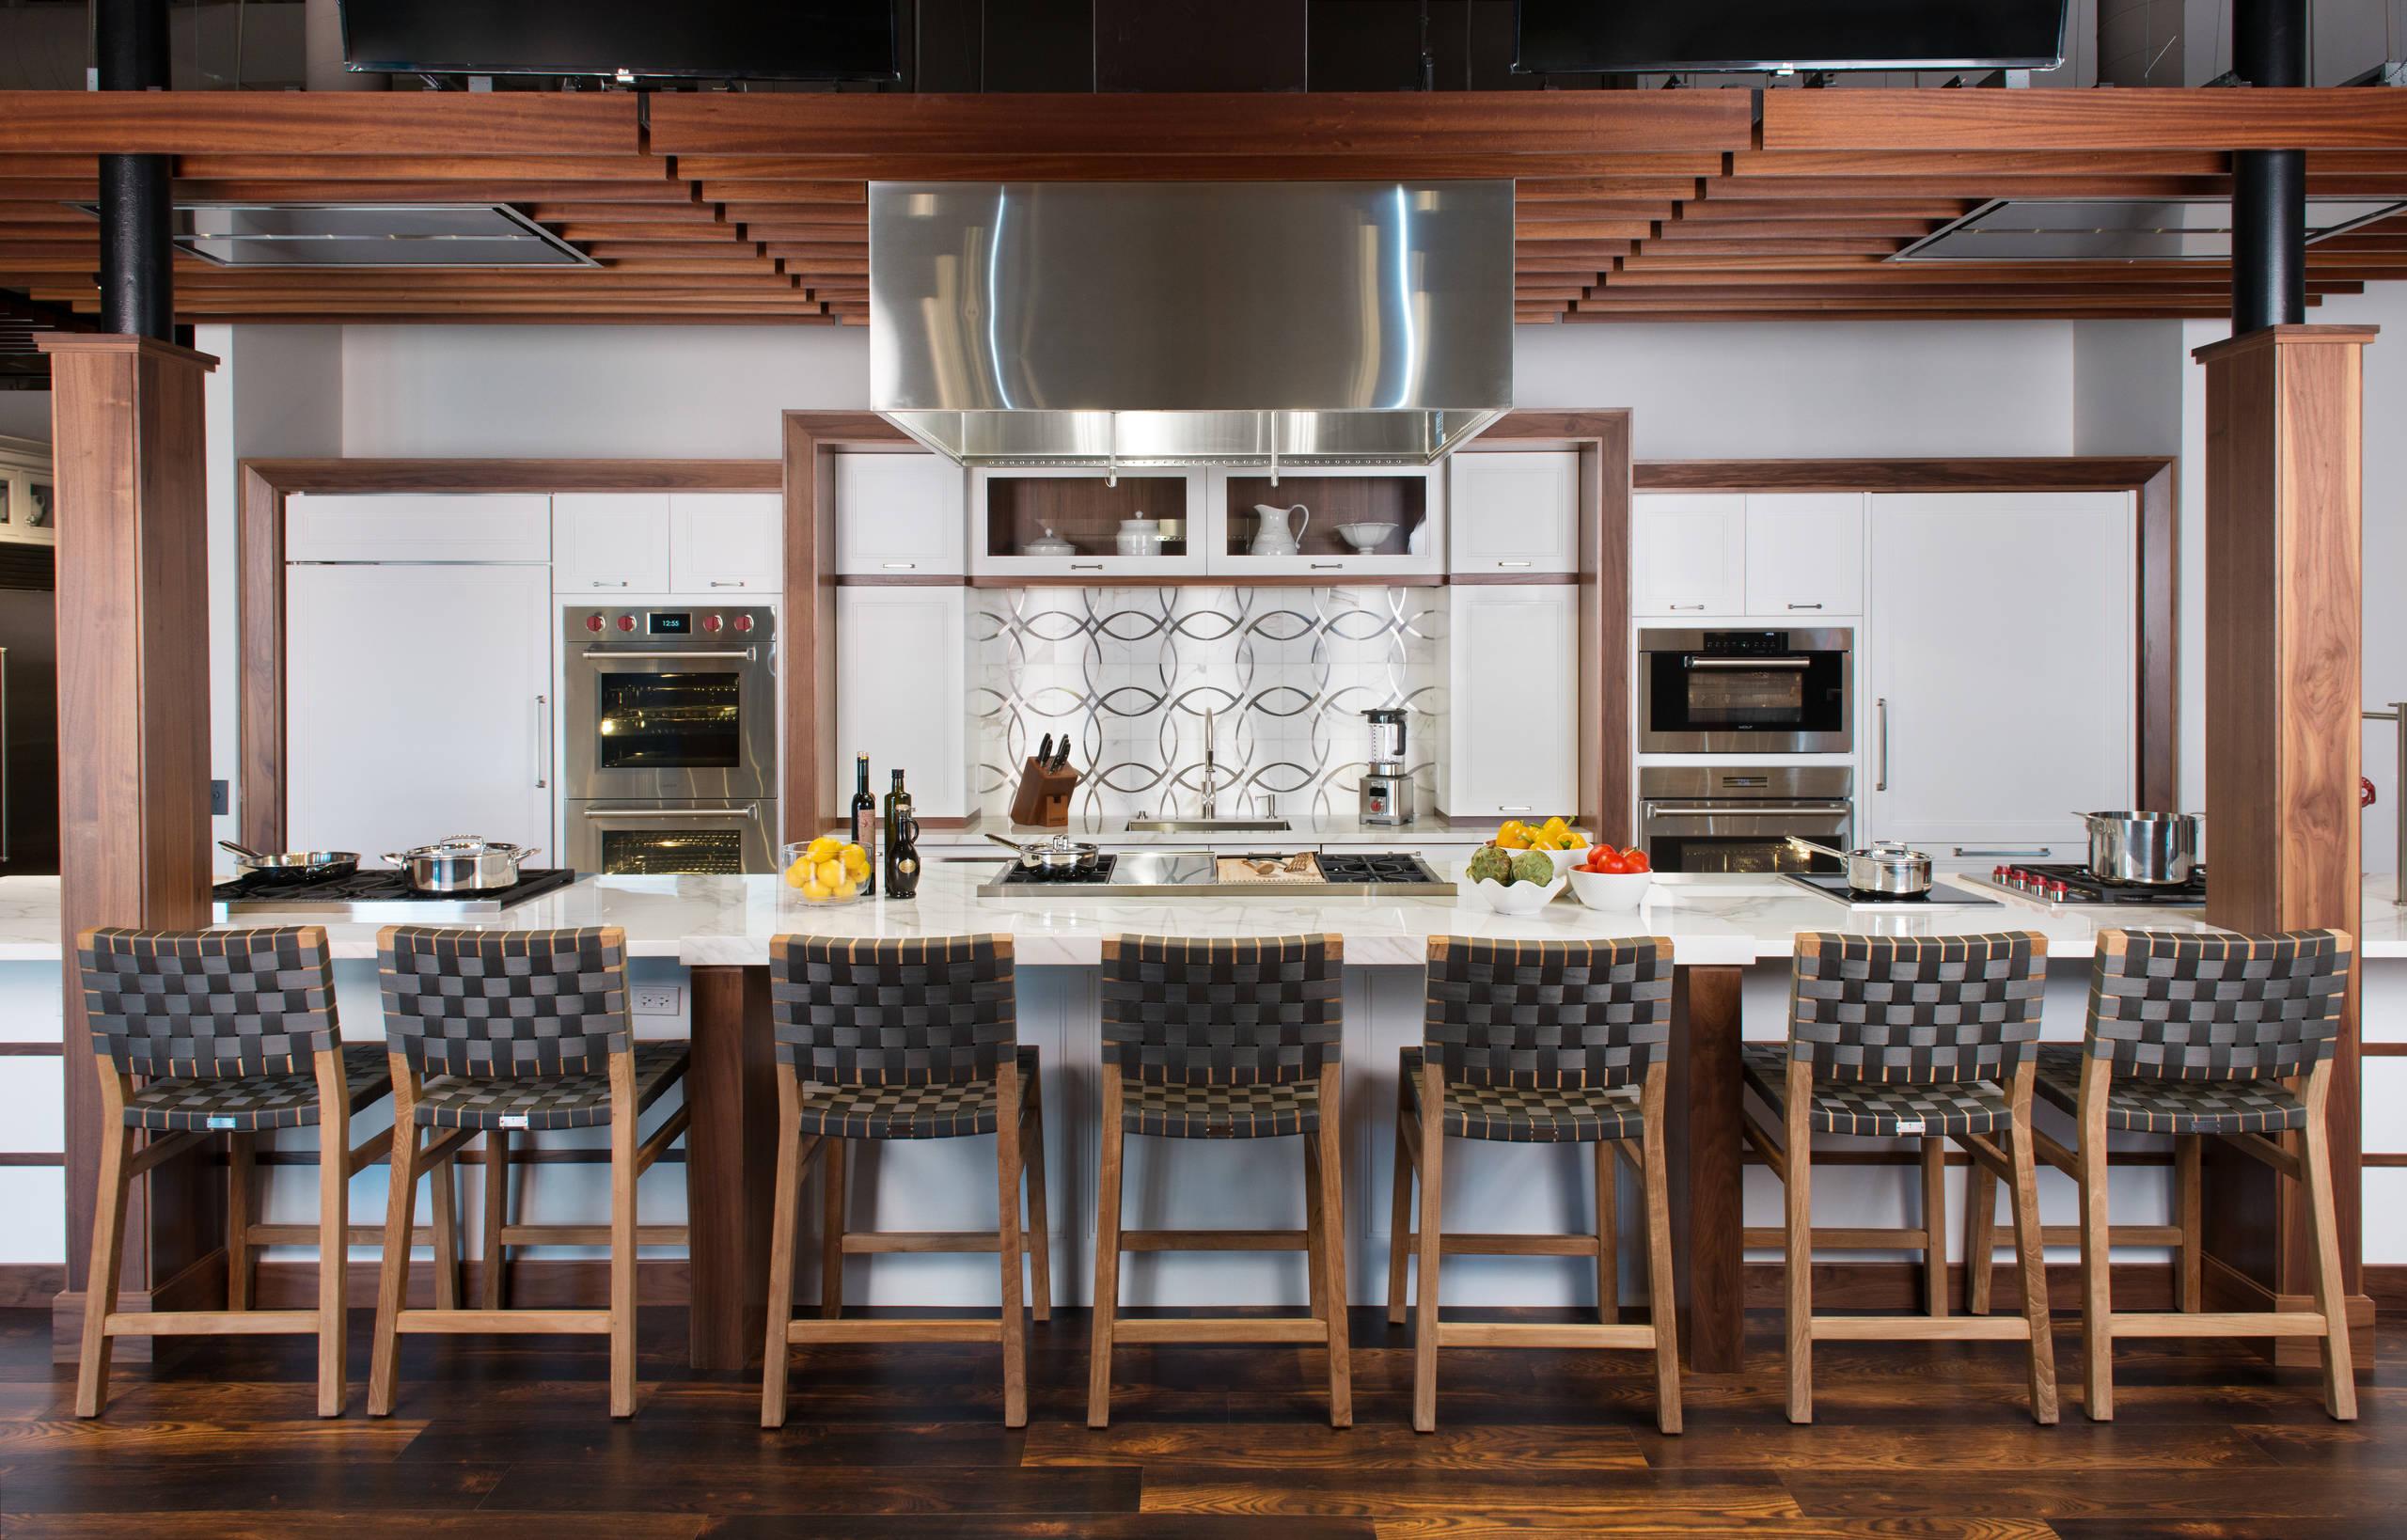 Test Kitchen - Boston, MA